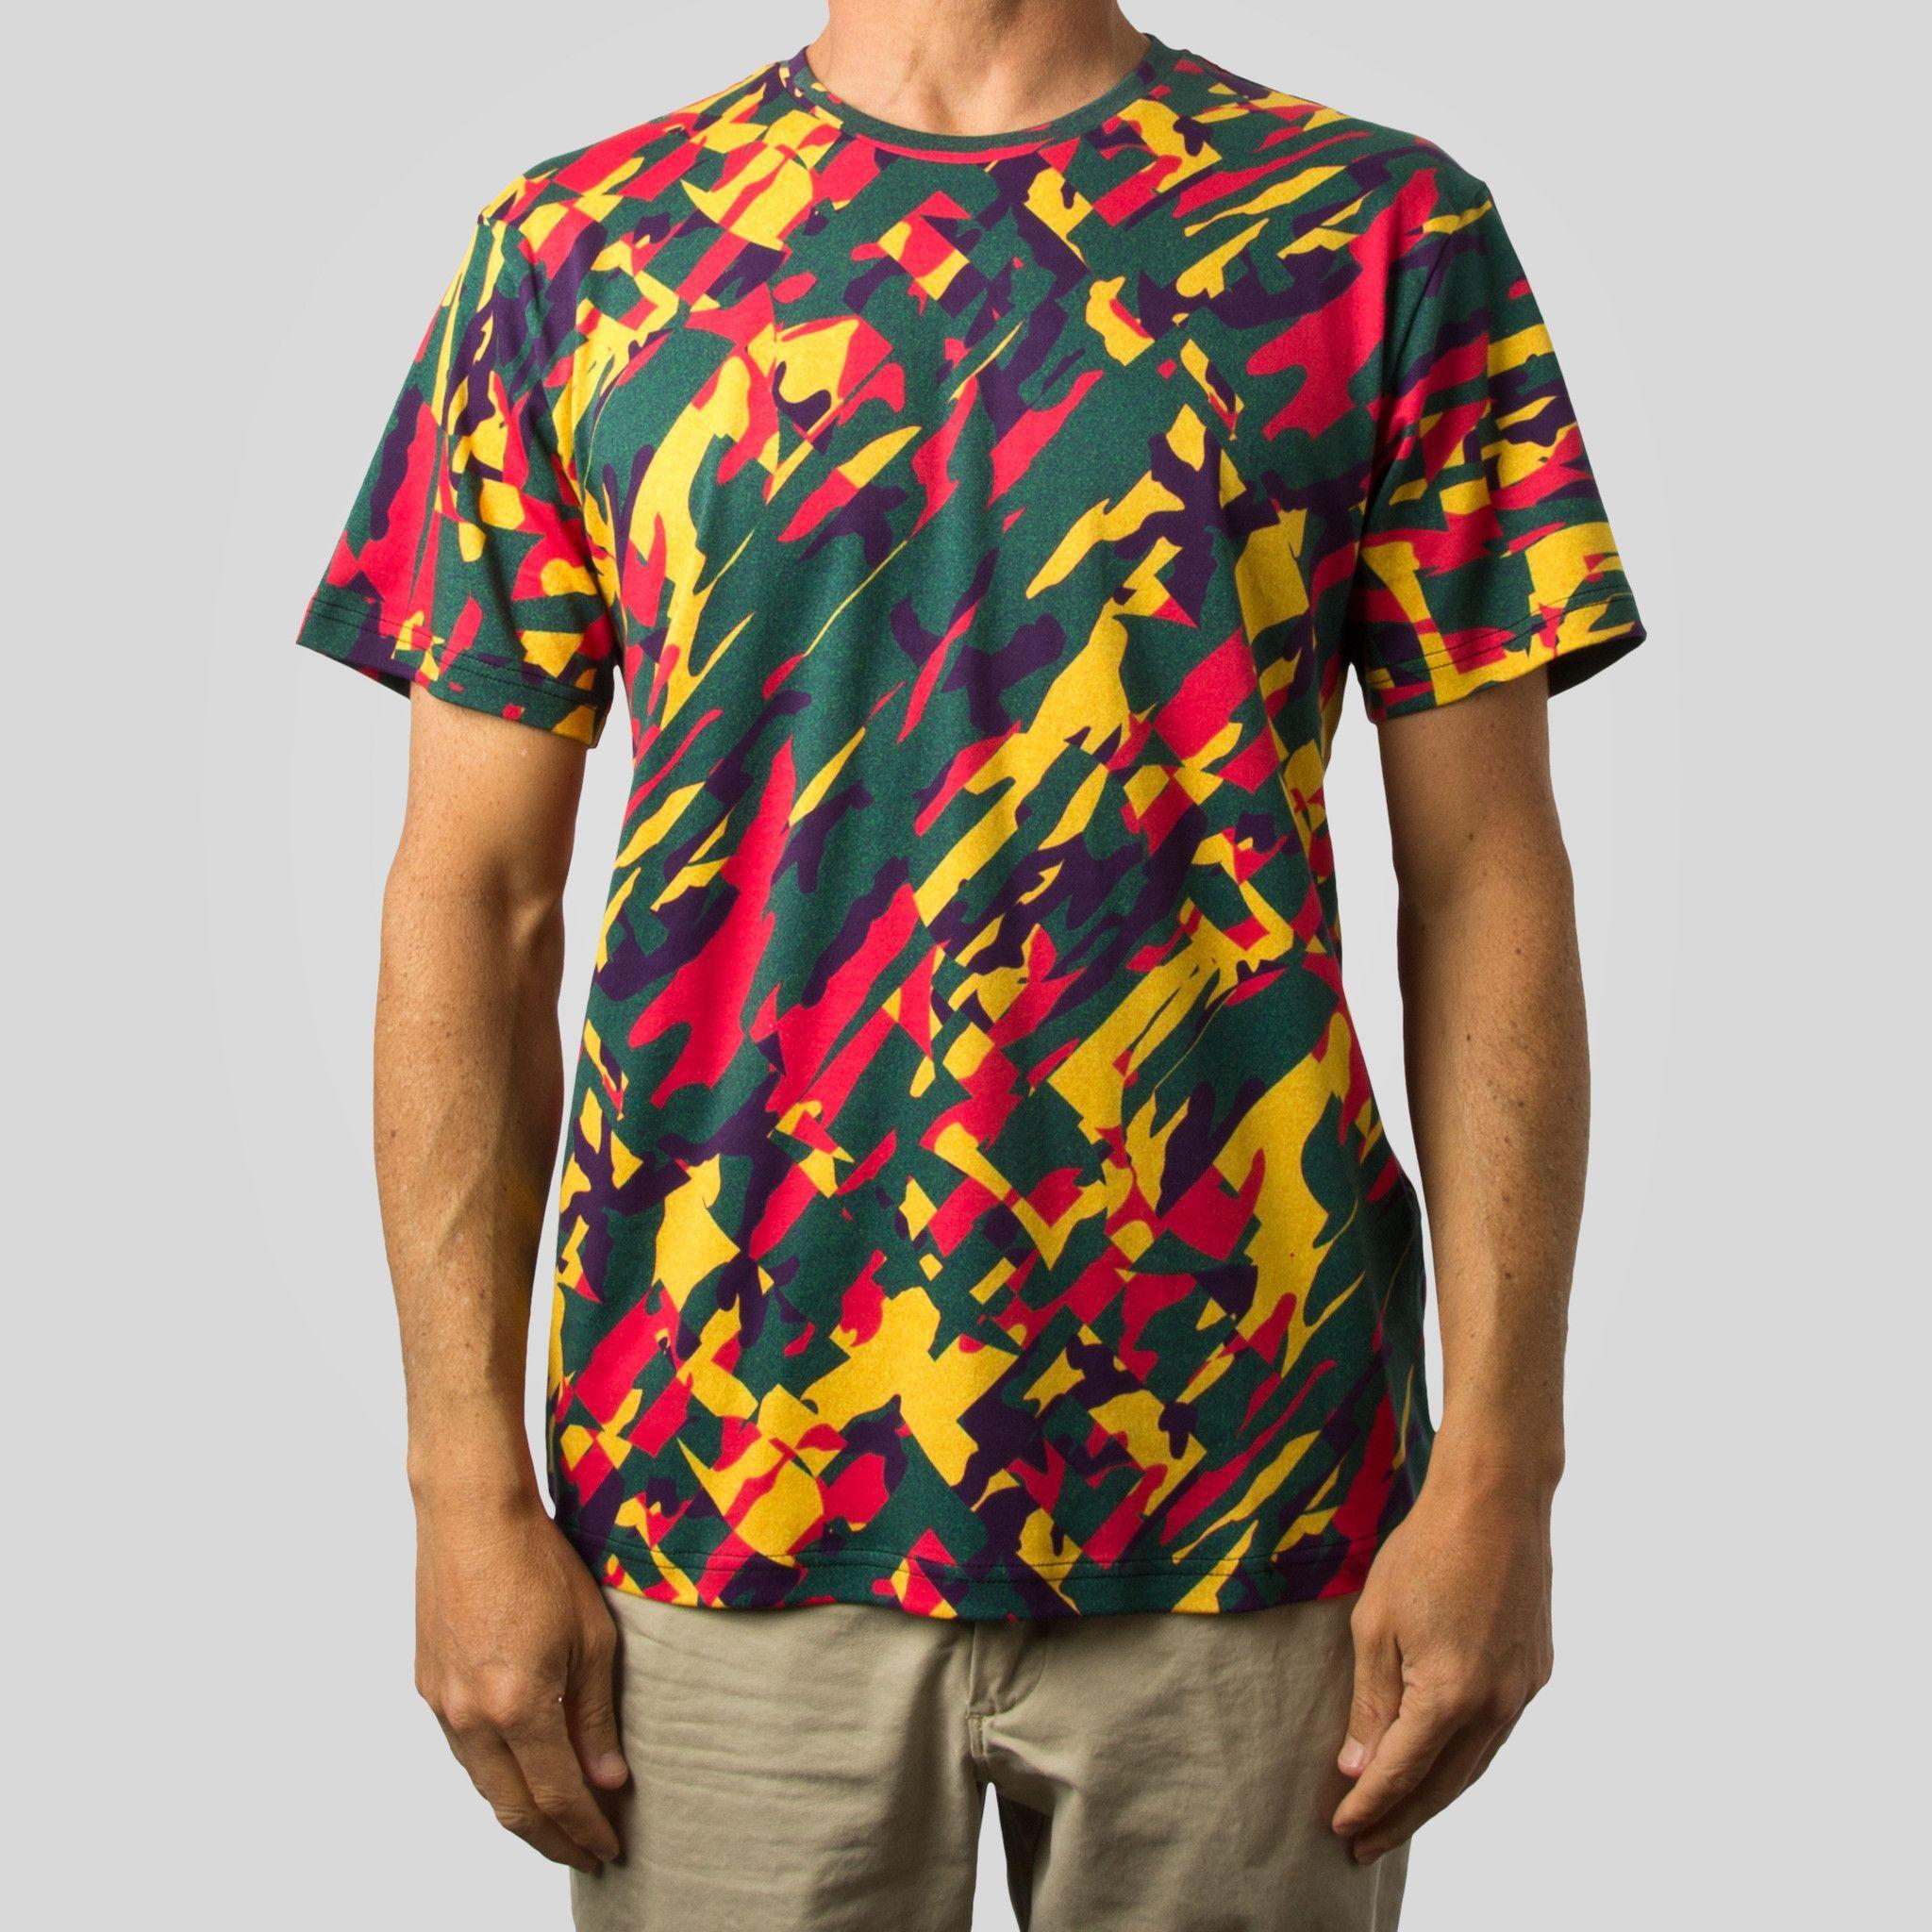 Psychic Army Premium T-Shirt - Tropical